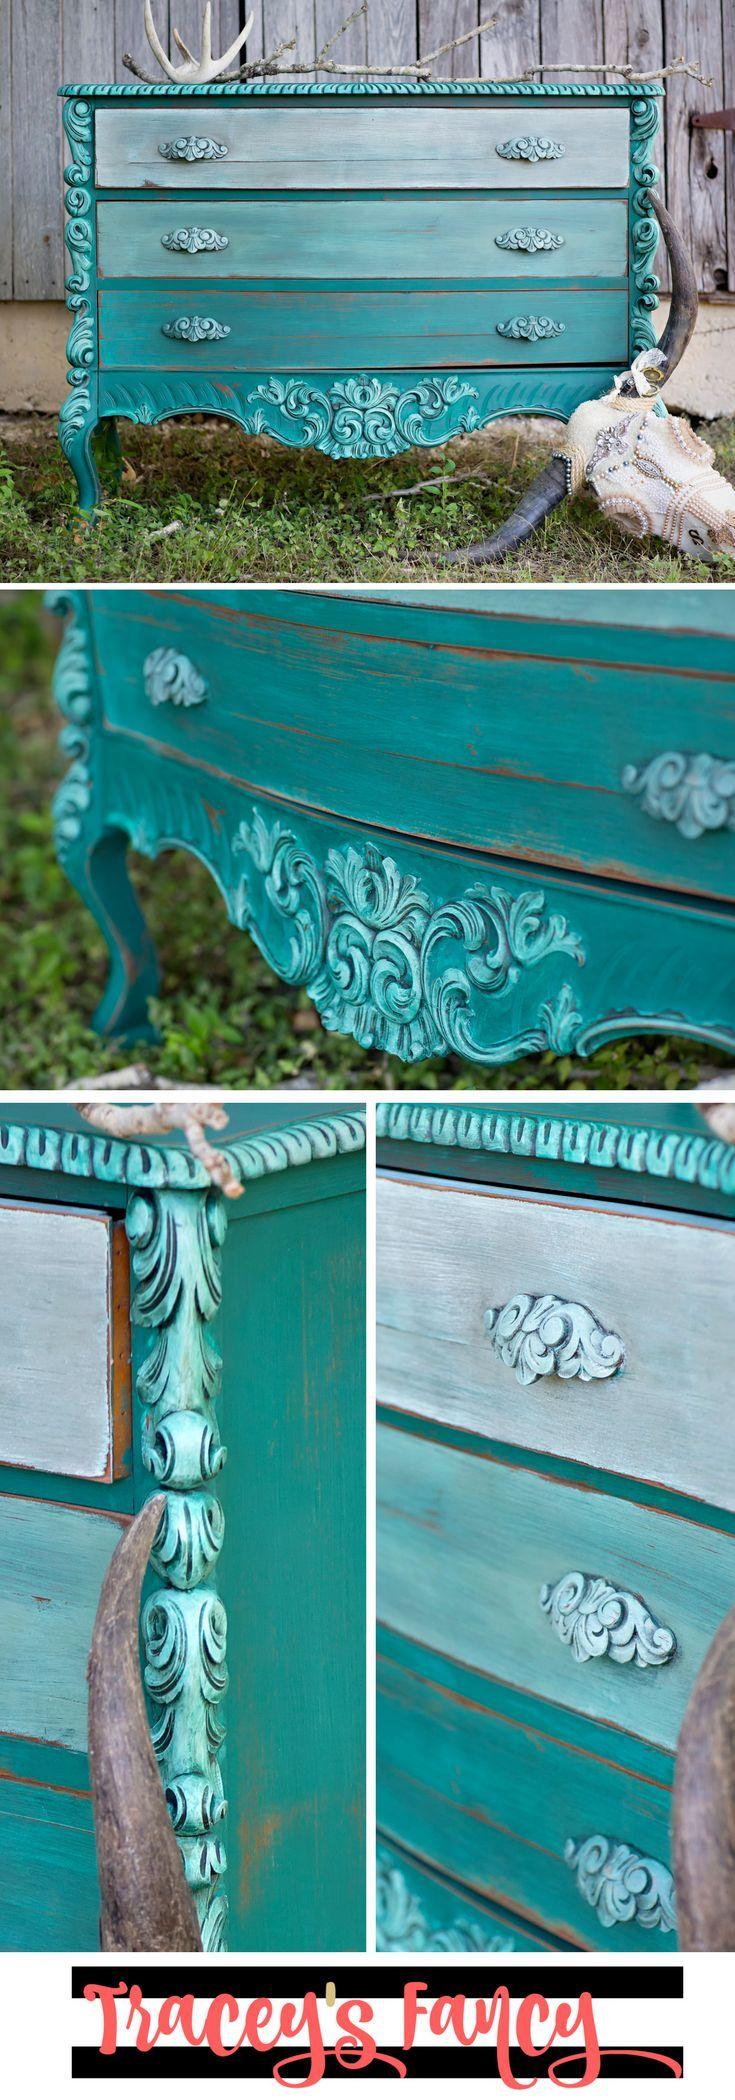 Teal Furniture Best 25 Teal Painted Dressers Ideas On Pinterest  Teal Furniture